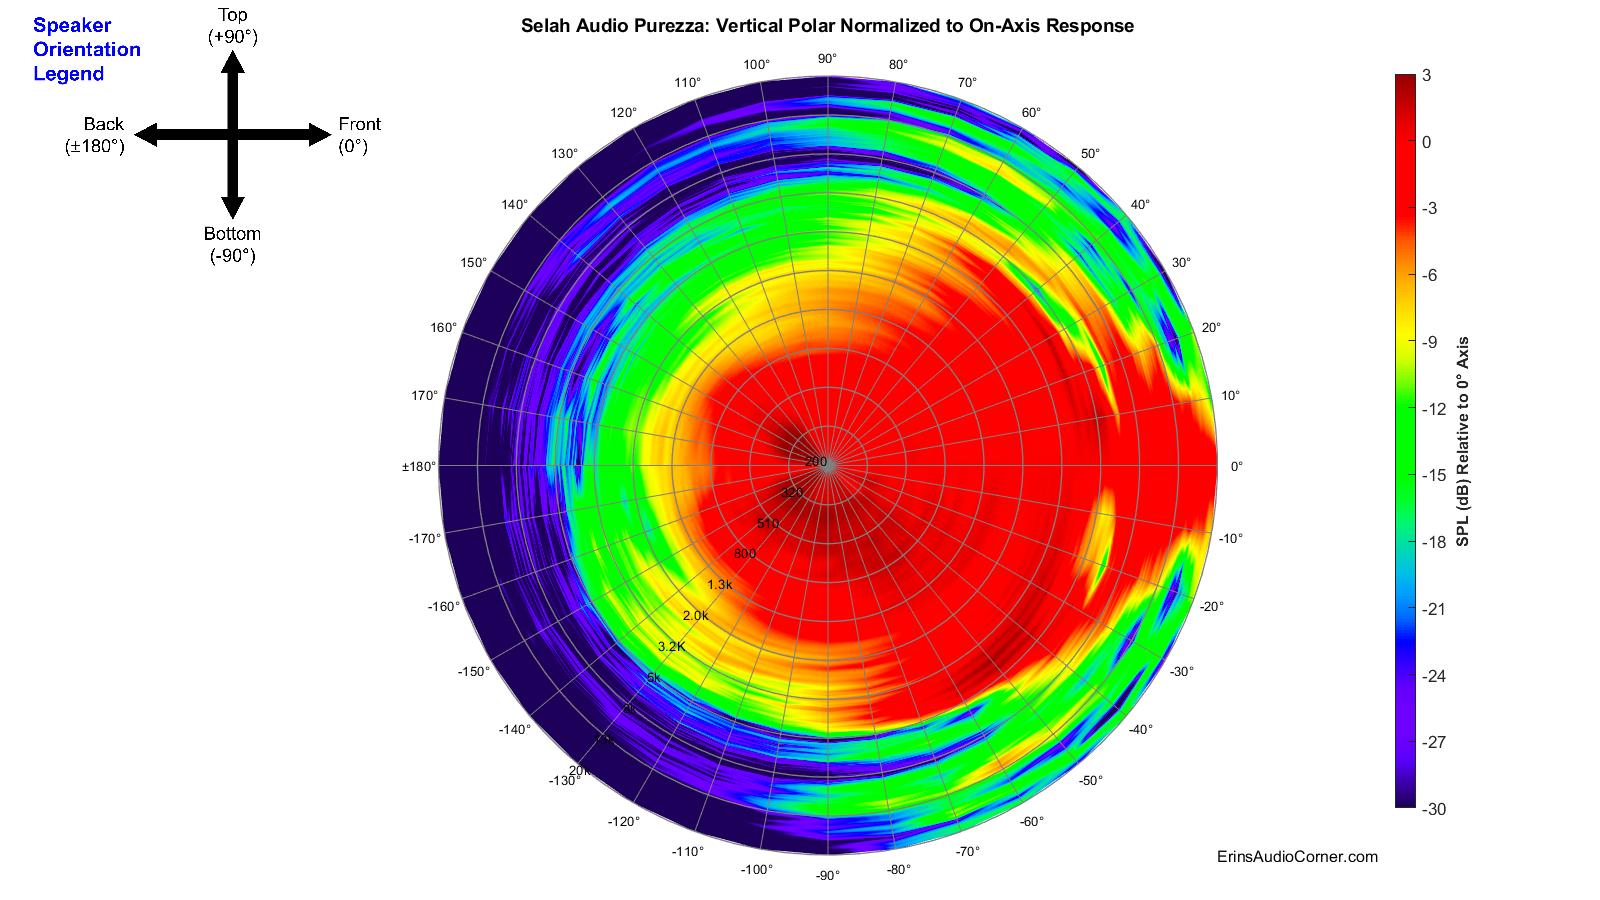 Selah%20Audio%20Purezza_360_Vertical_Polar_Normalized.png